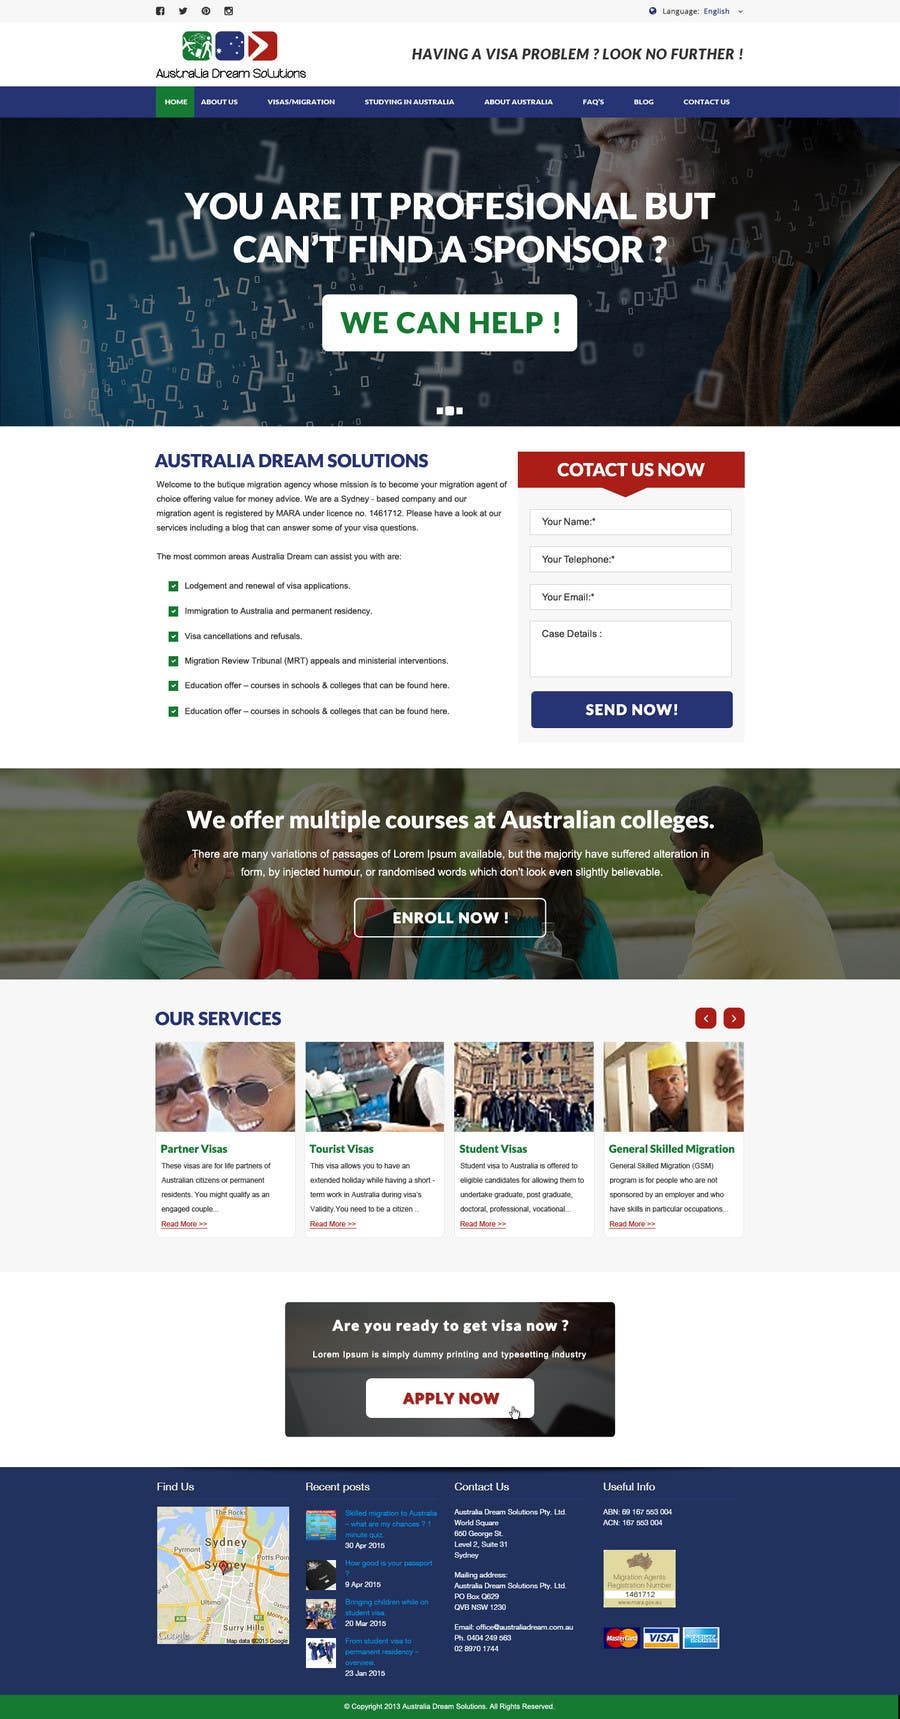 Kilpailutyö #11 kilpailussa Home page redesign by making it sales-focused (legal services).